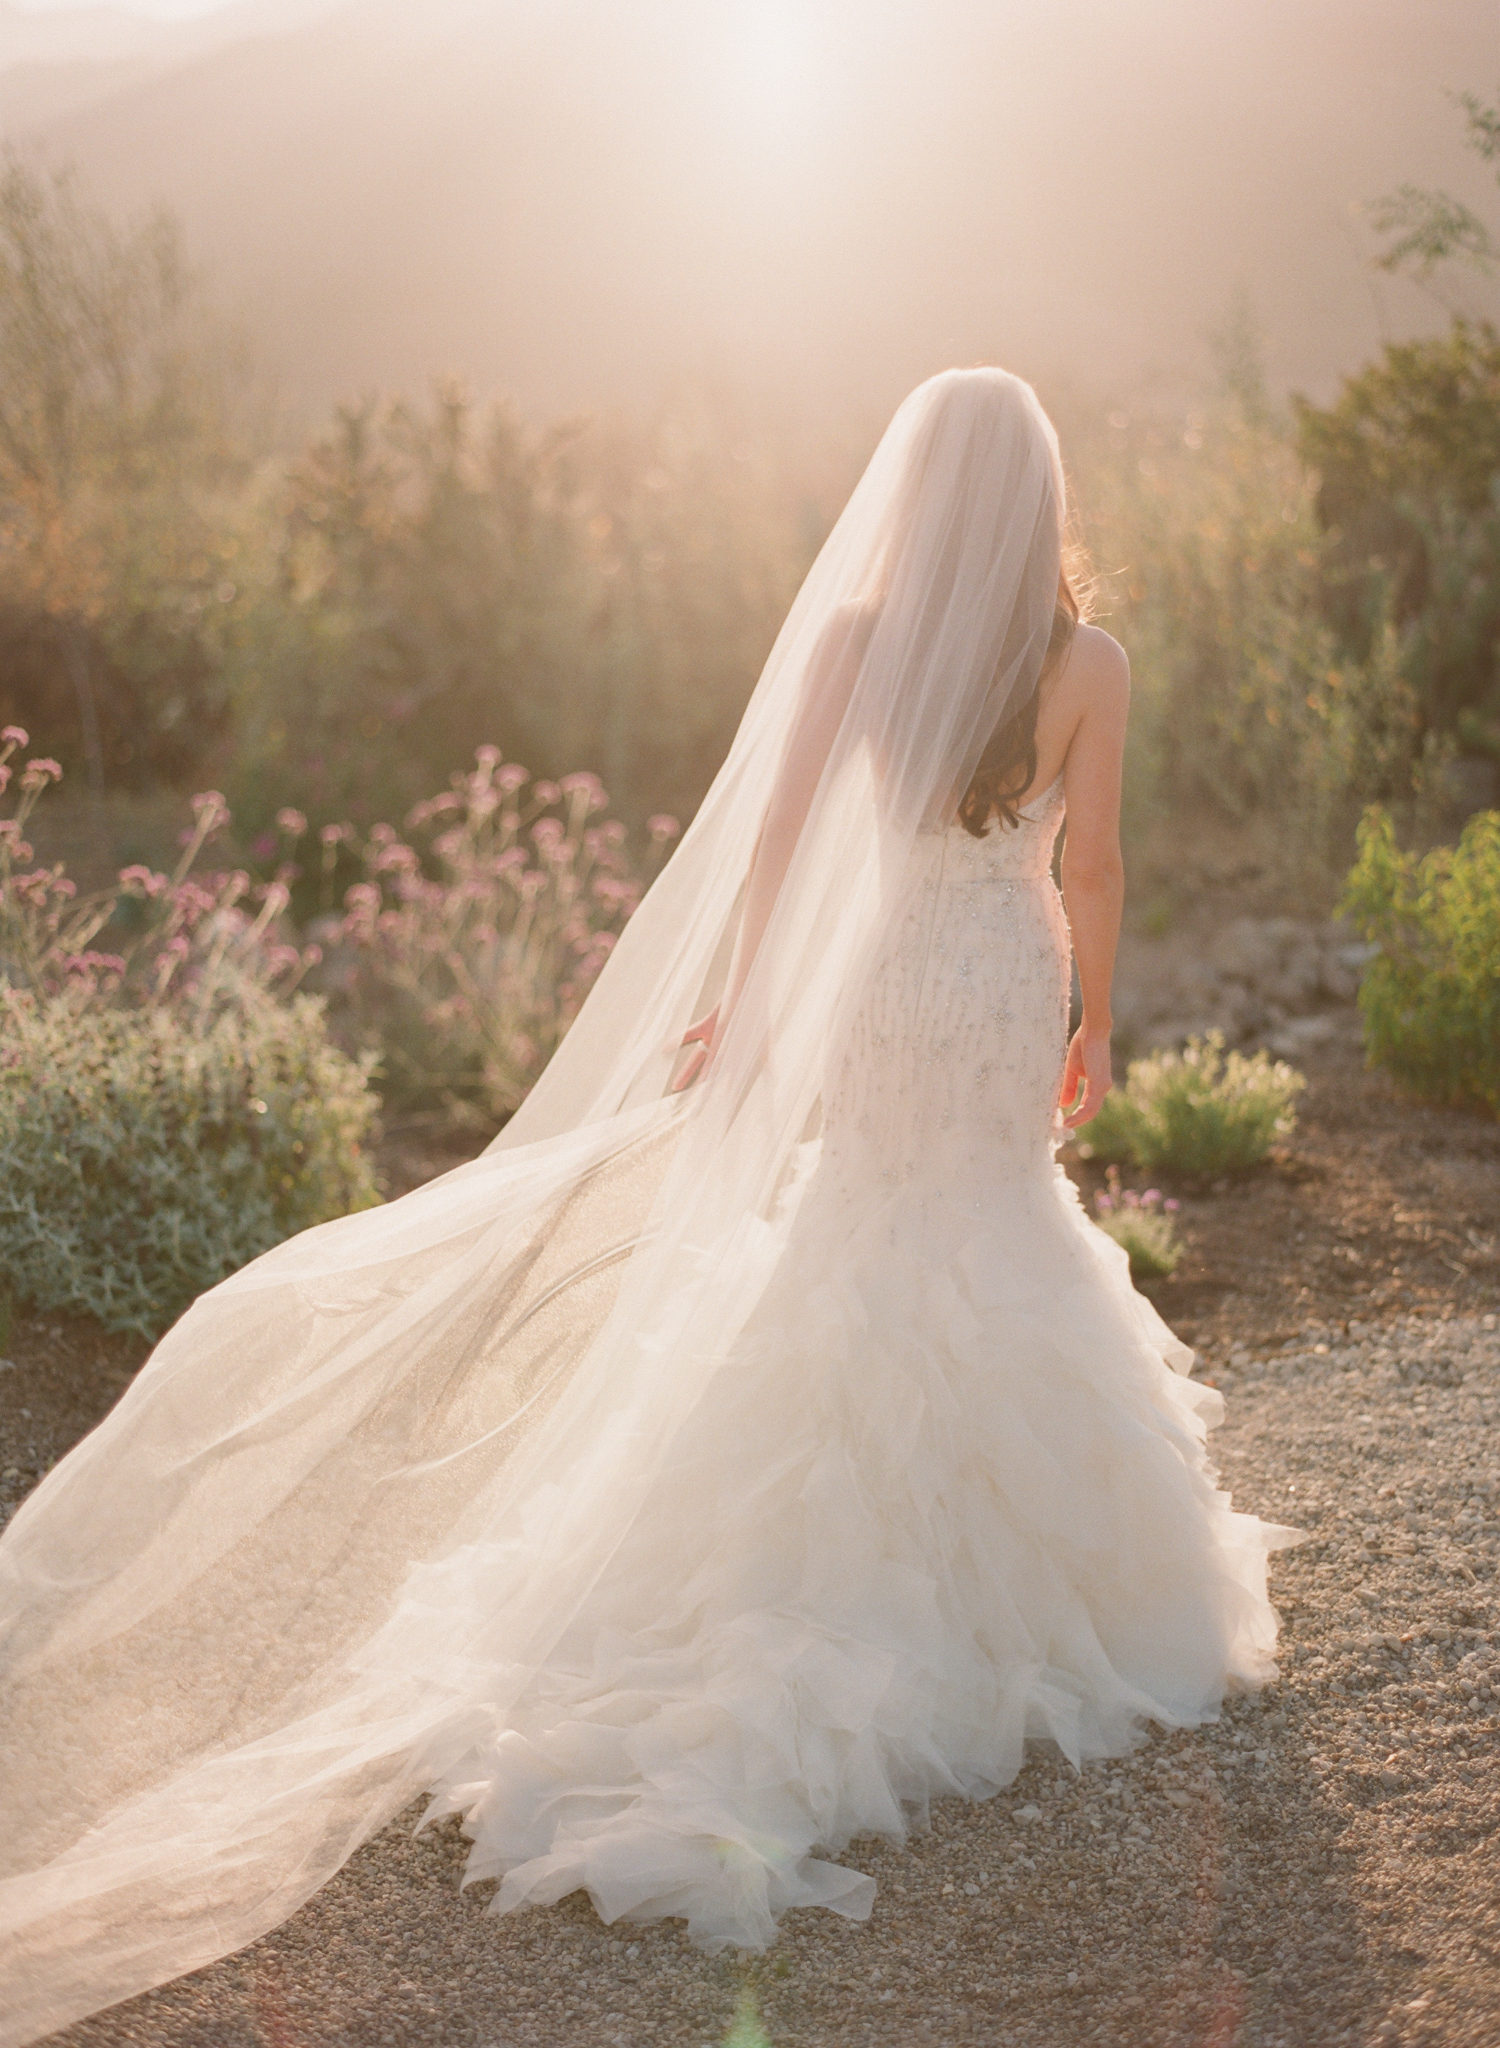 18 Private Estate Wedding Event Design by Joy Proctor.JPG